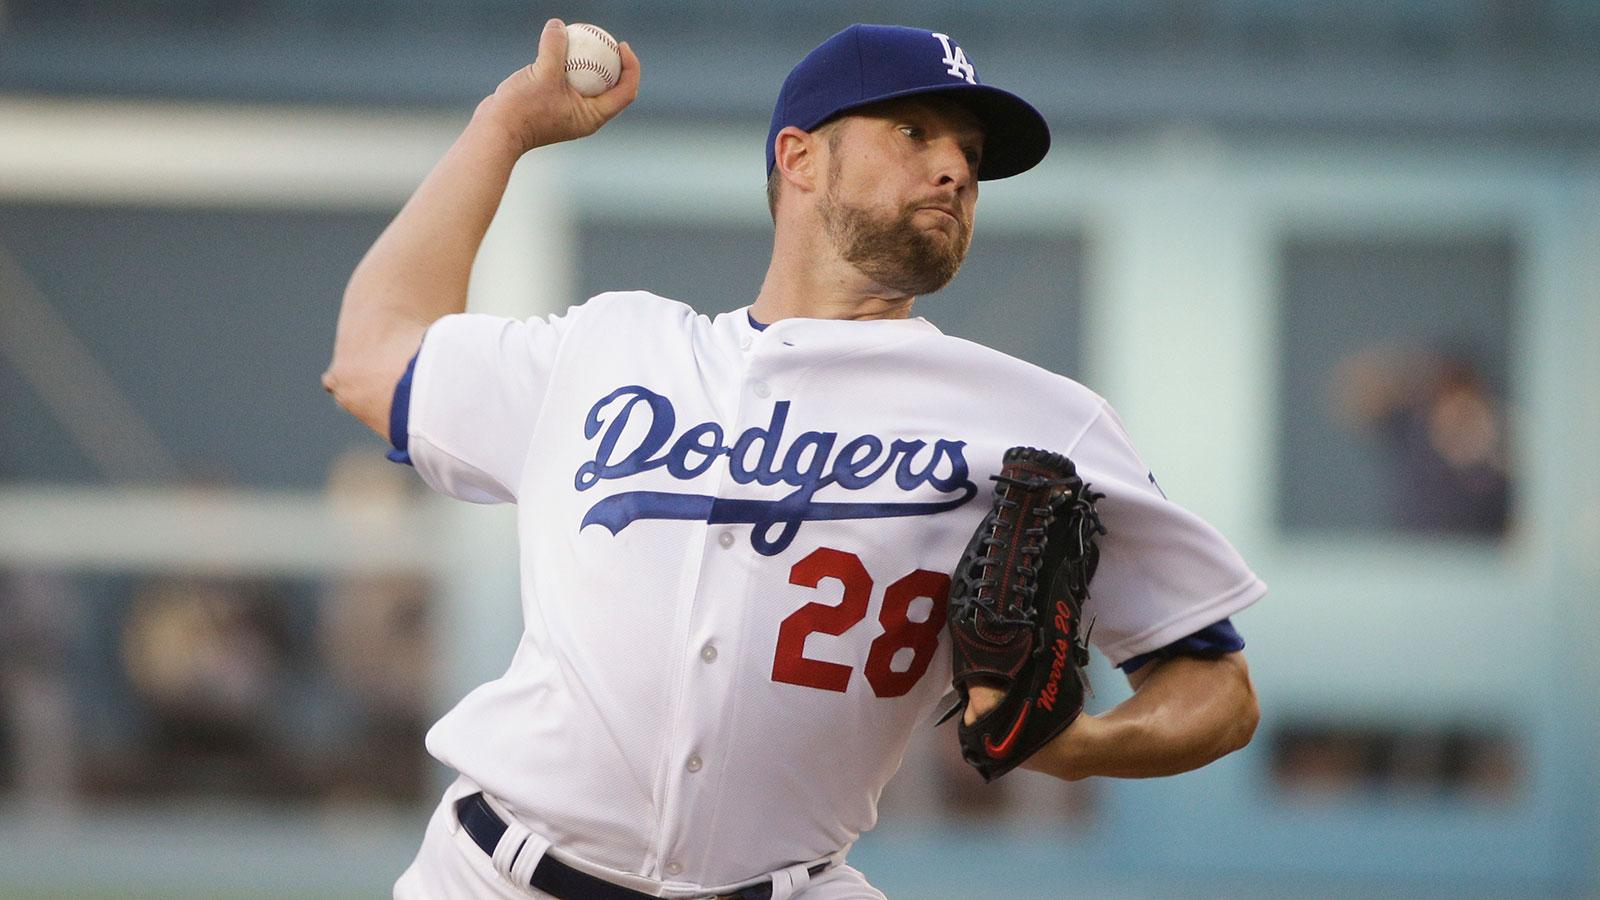 Bud Norris dominant filling in for Clayton Kershaw in Dodgers debut